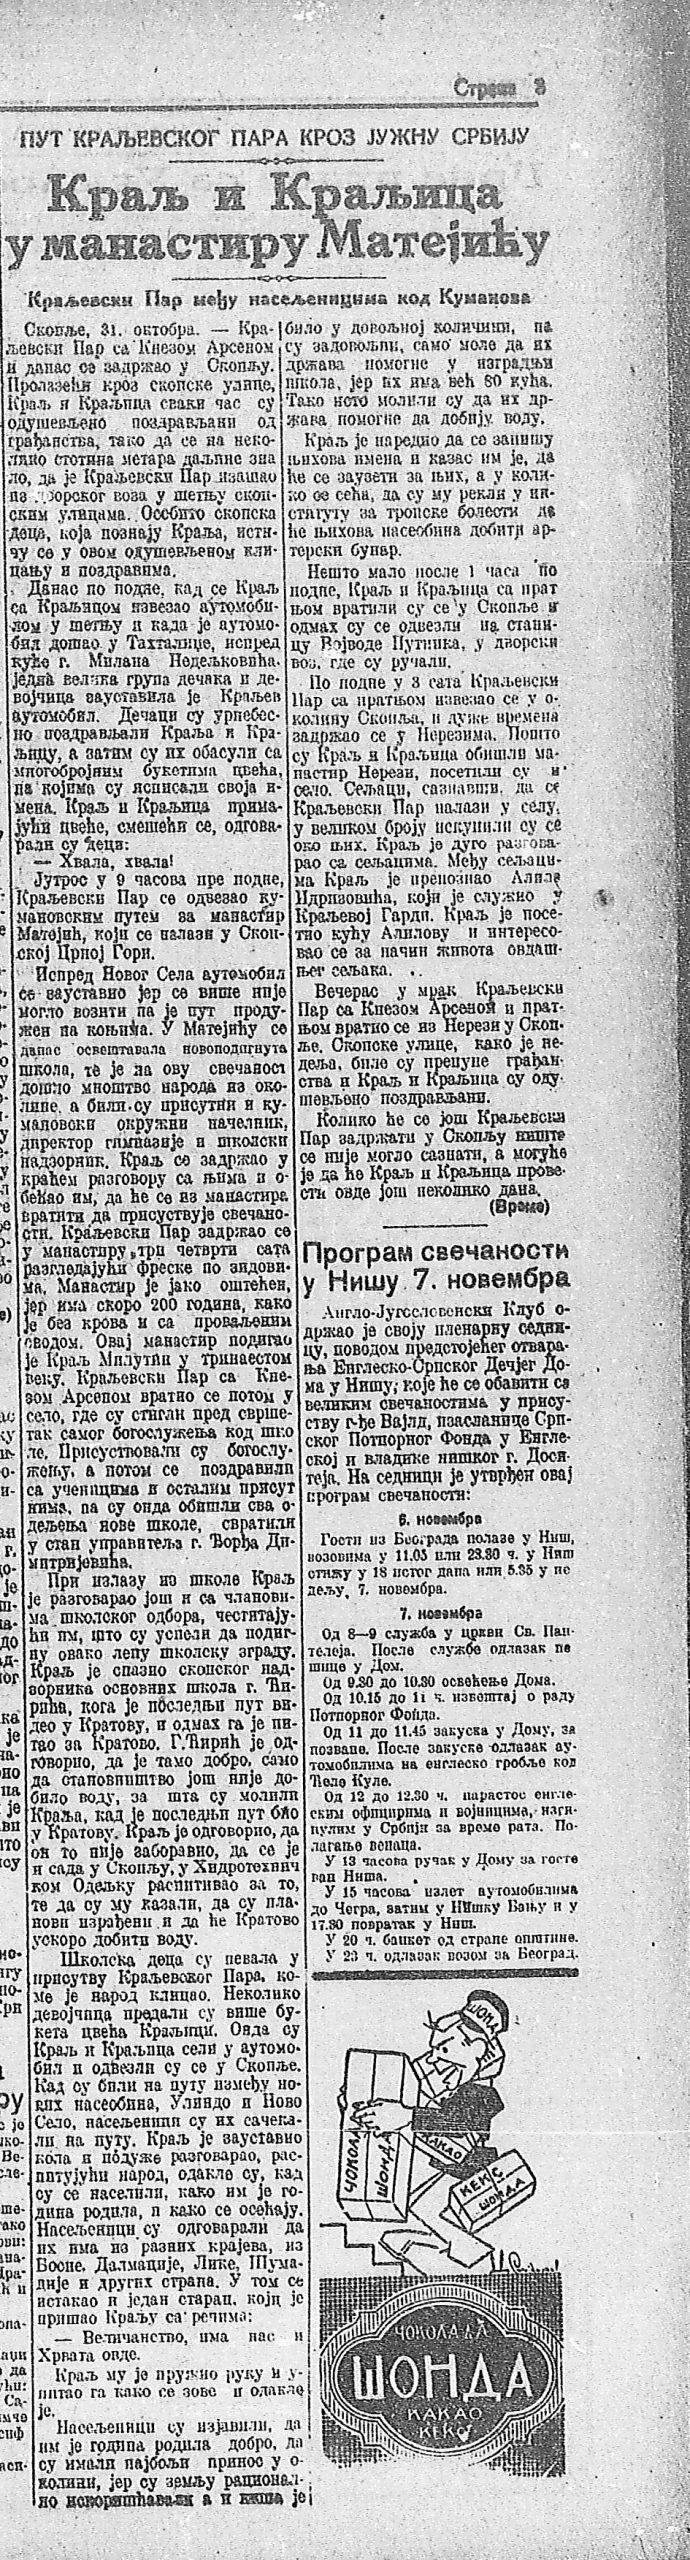 Vreme-1.novembar-1926.godine-strana-3.-scaled.jpg